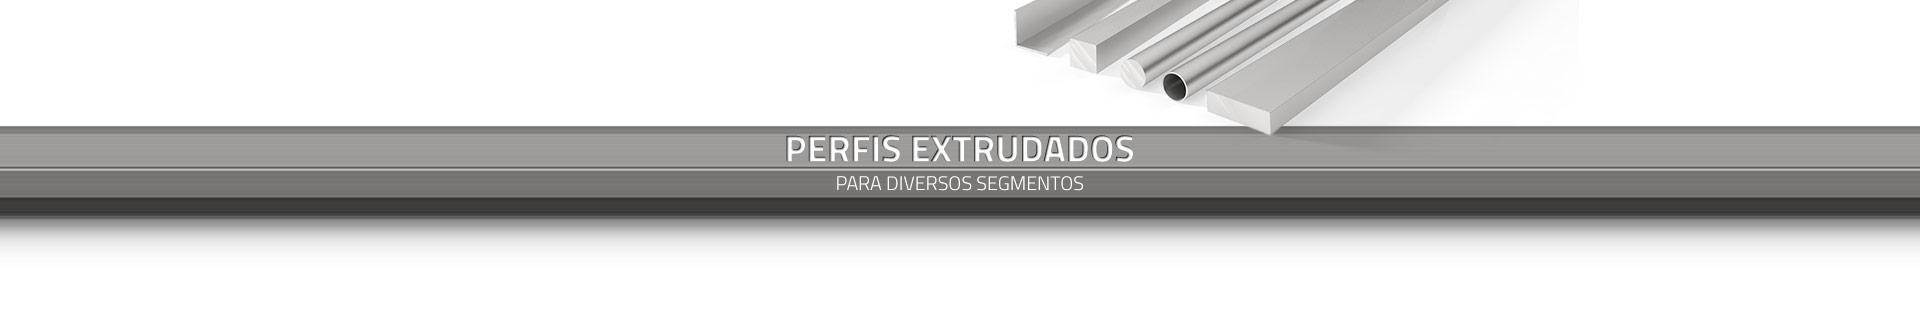 banner-perfis1